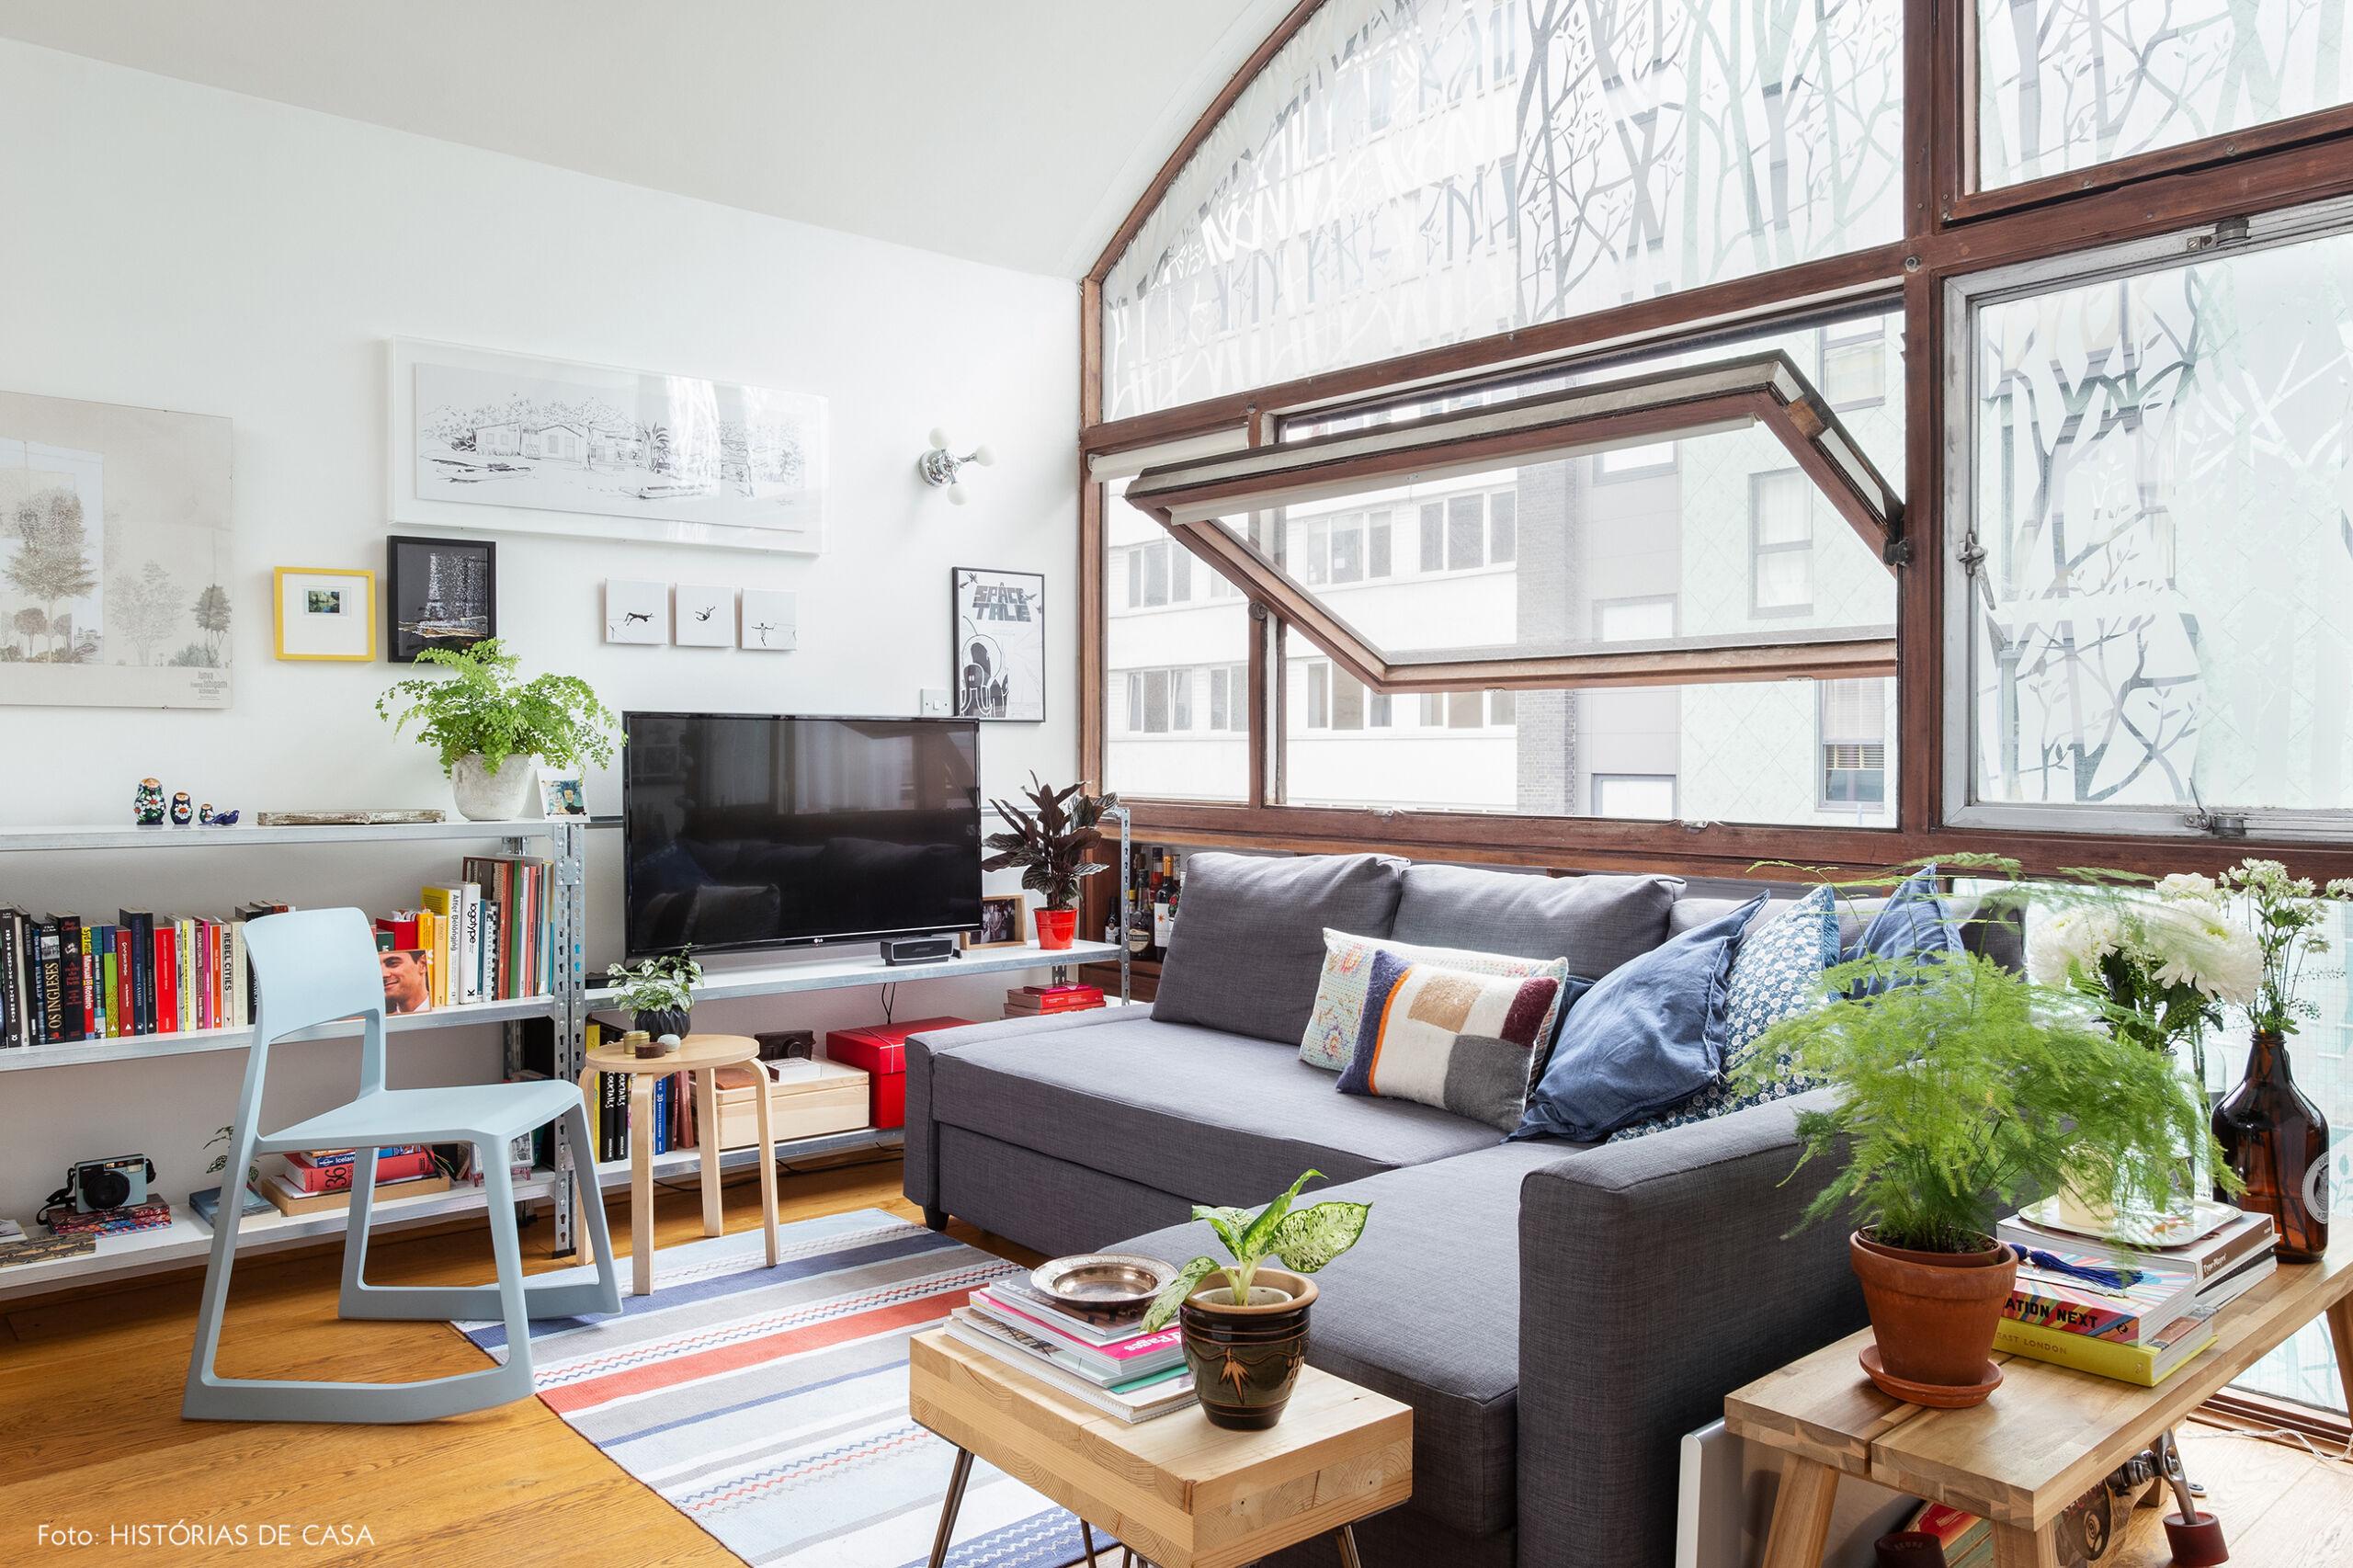 03-decoracao-arquitetura-apartamento-pequeno-grandes-janelas